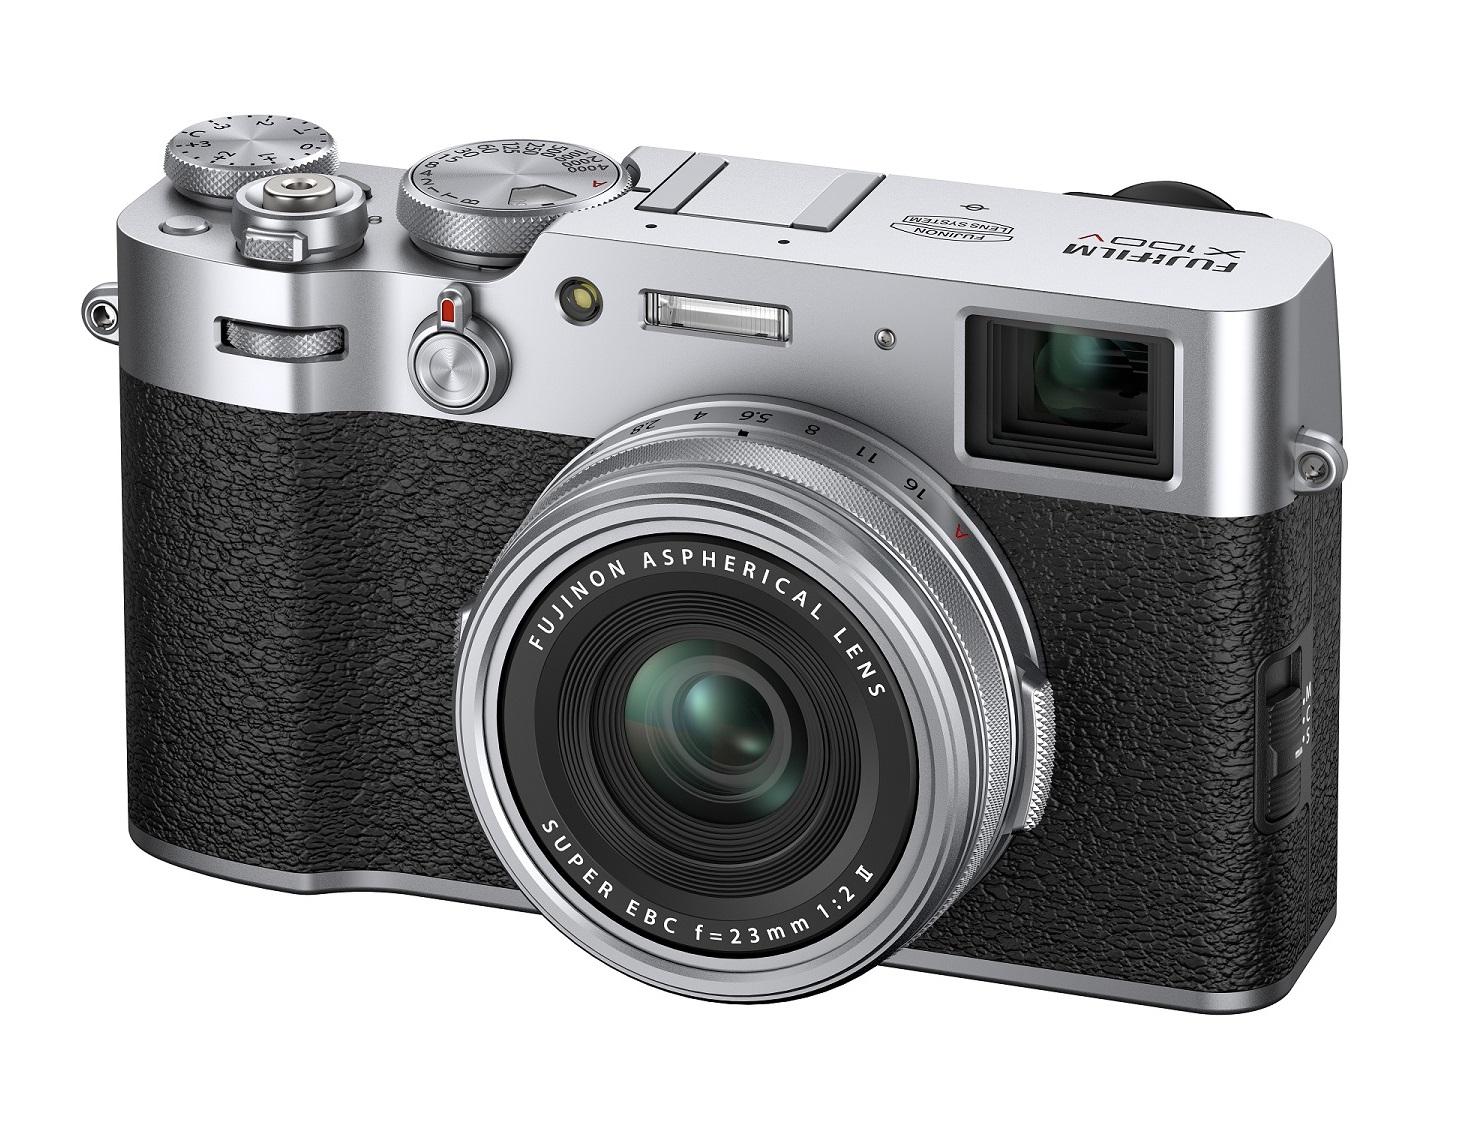 https://i0.wp.com/digital-photography-school.com/wp-content/uploads/2021/03/best-cameras-for-street-photography-fuji-x100v.jpg?resize=1463%2C1137&ssl=1